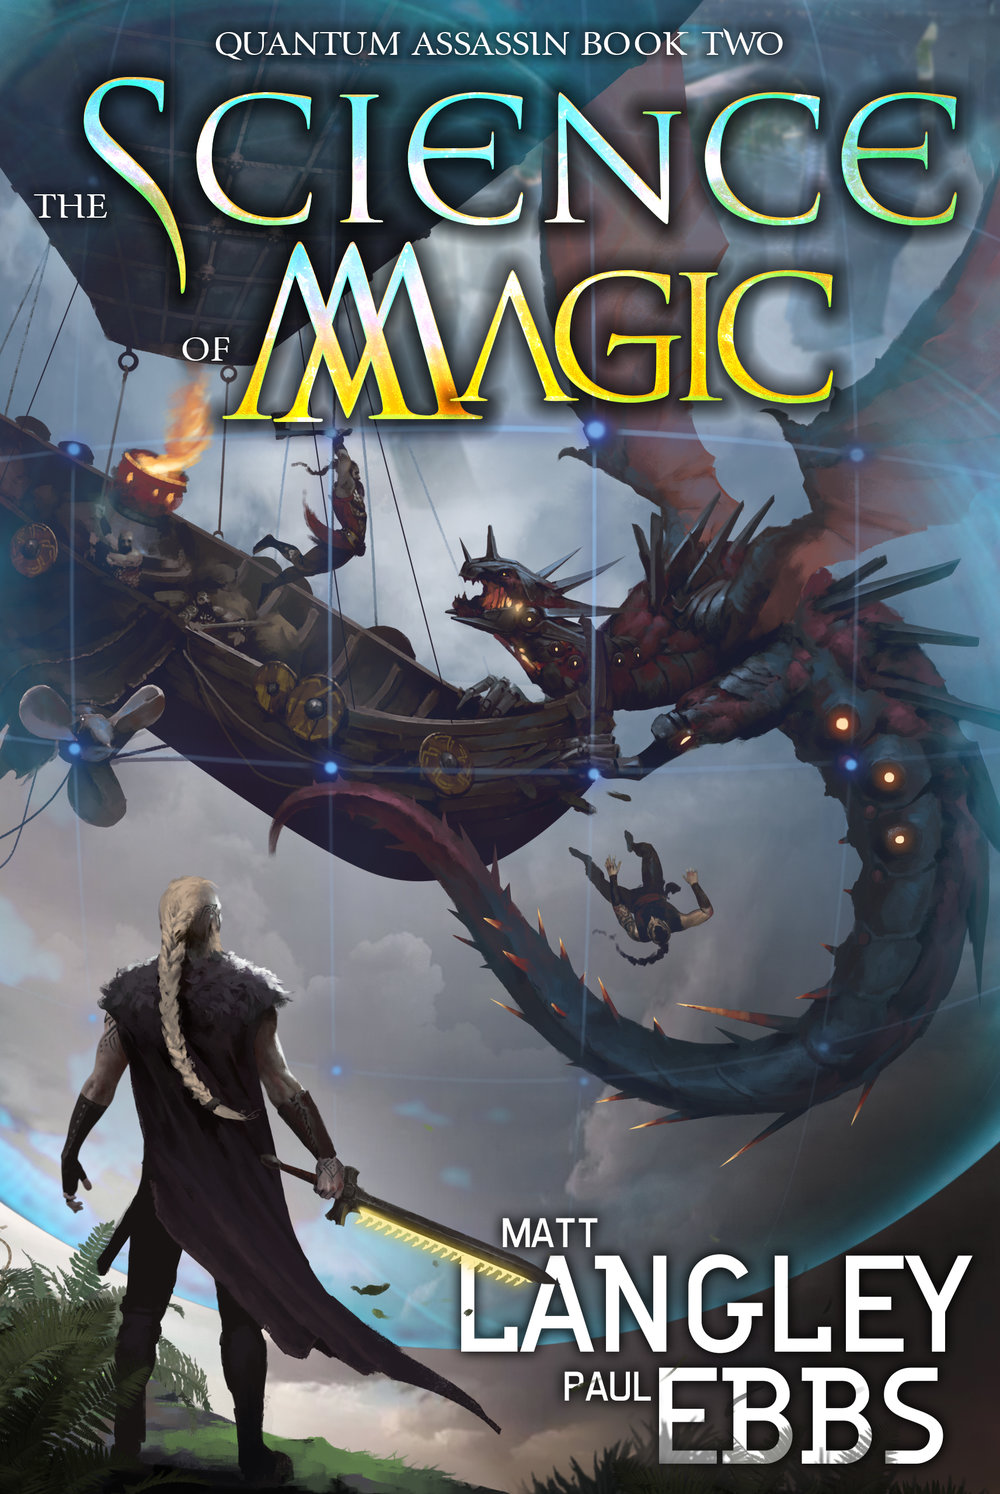 The Science of Magic   Quantum Assassin Book 2  Matt Langley, Paul Ebs